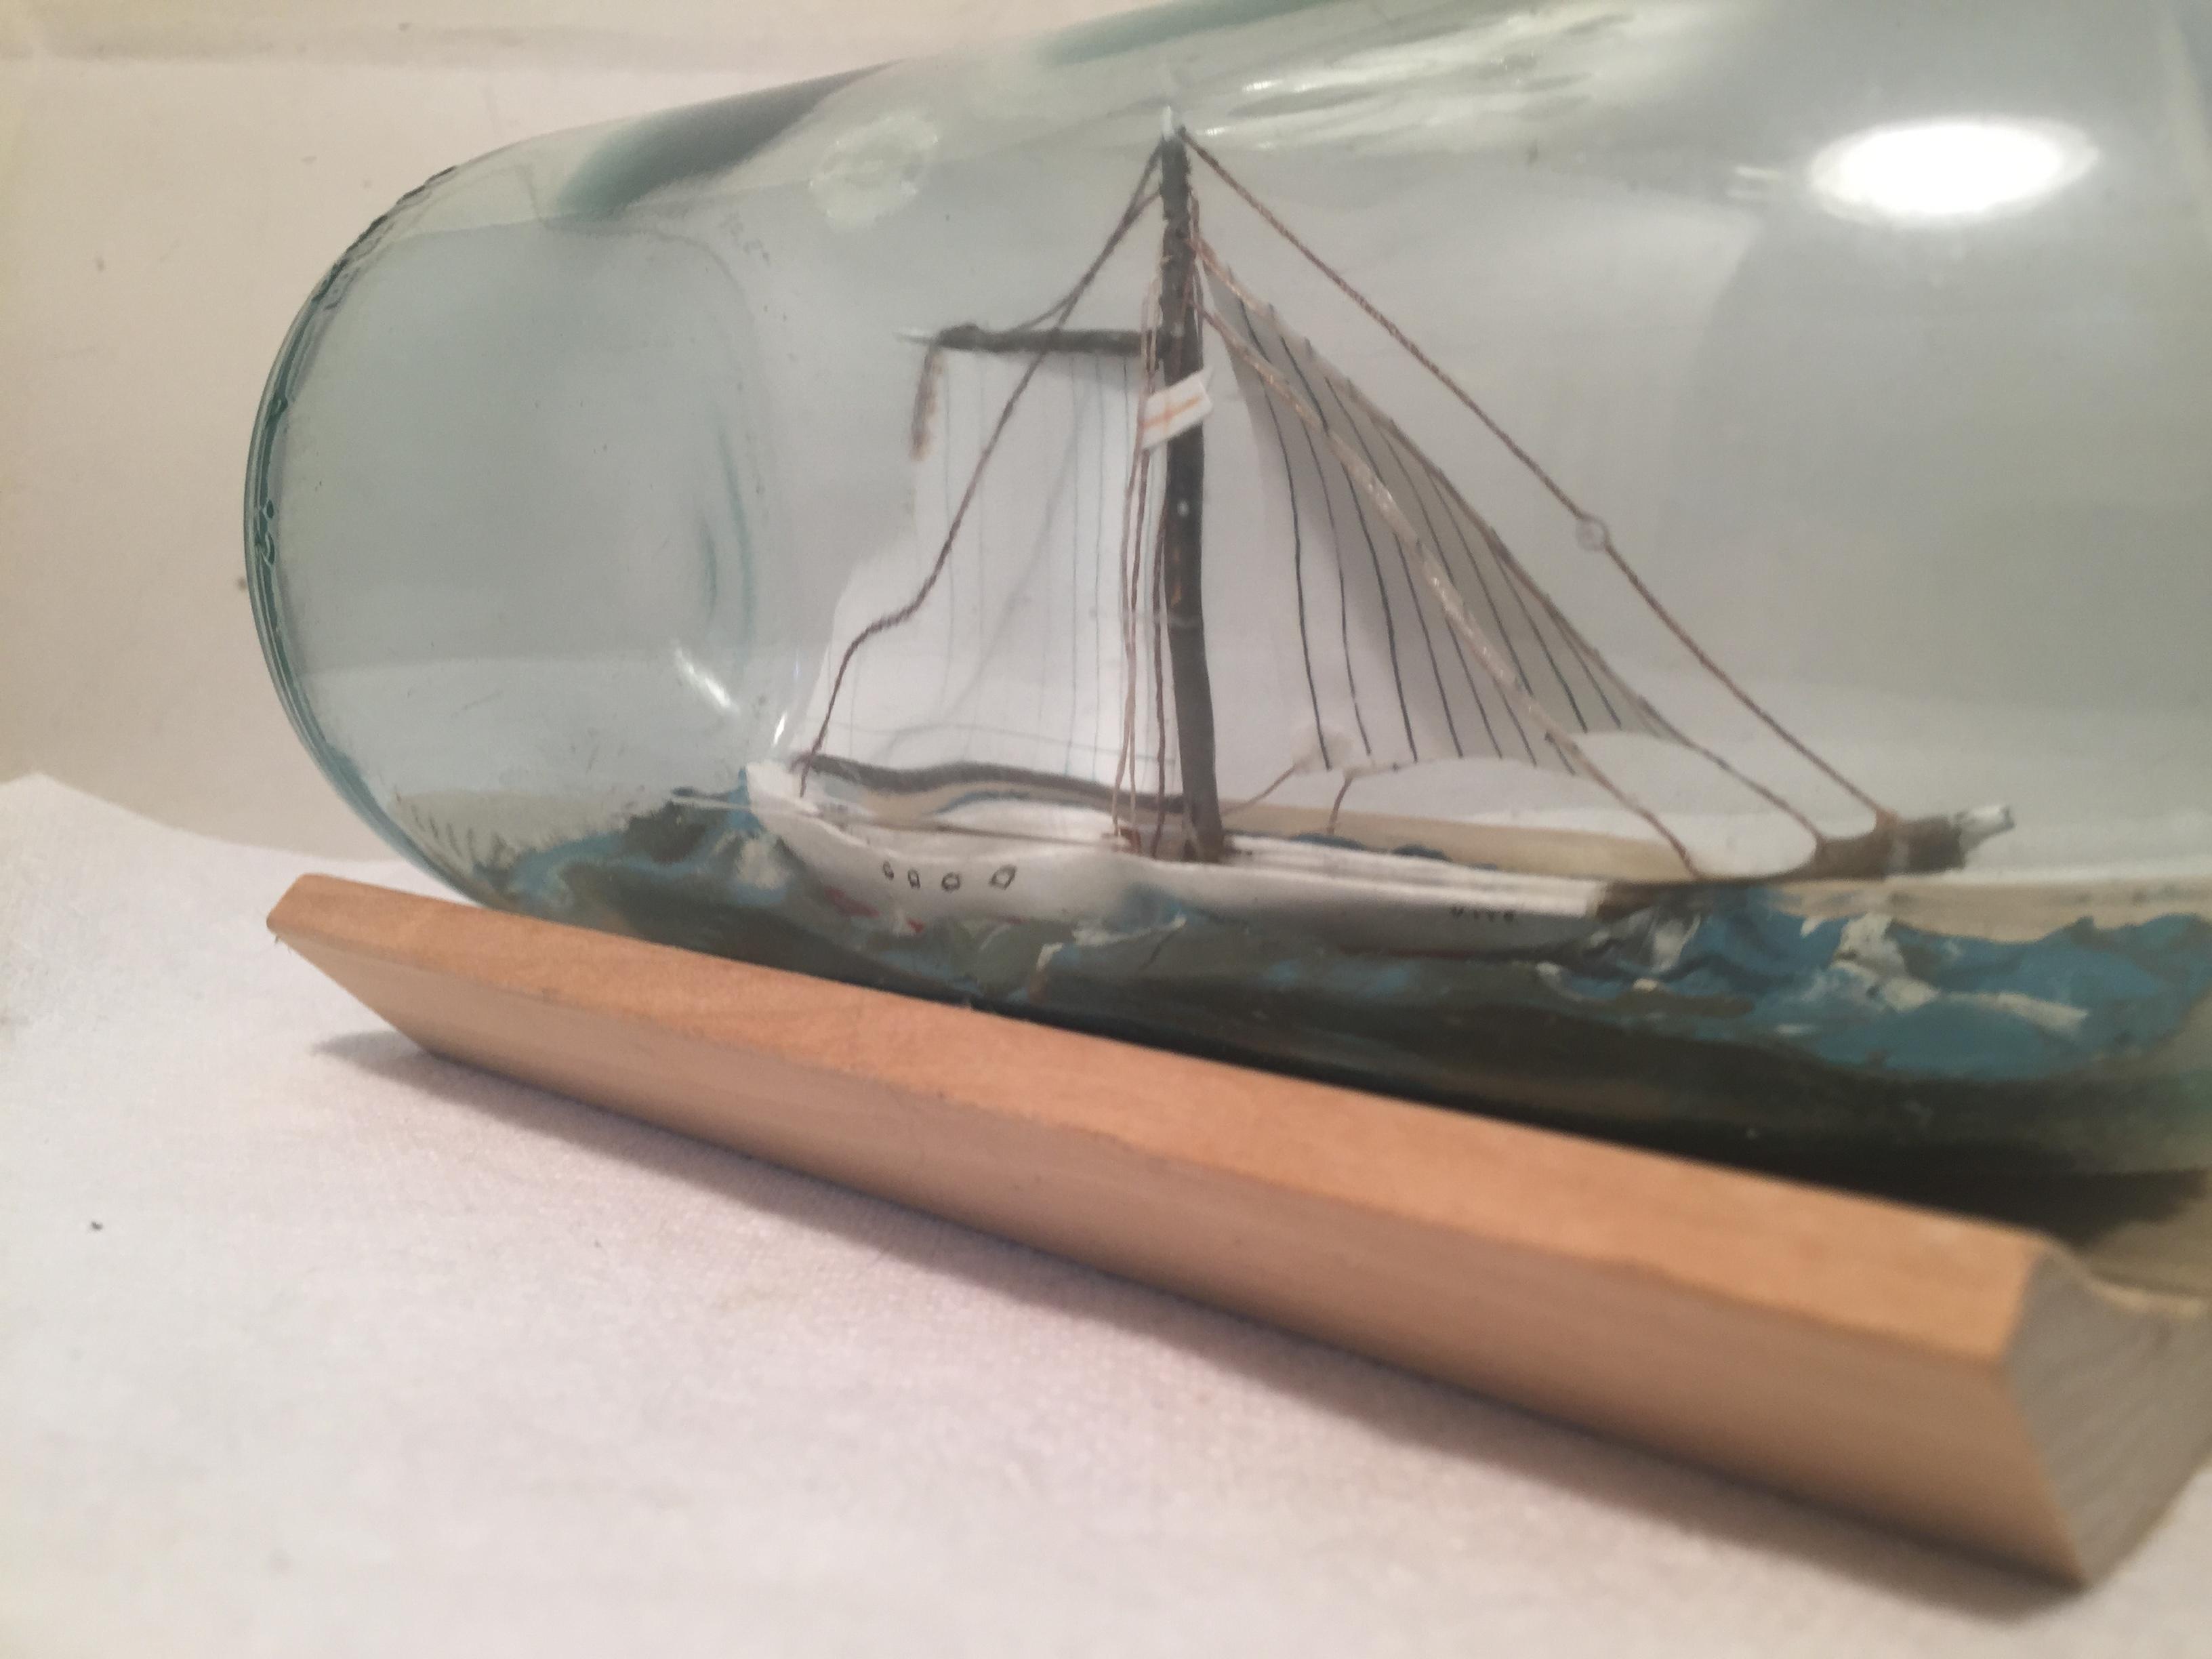 sloop in a bottle